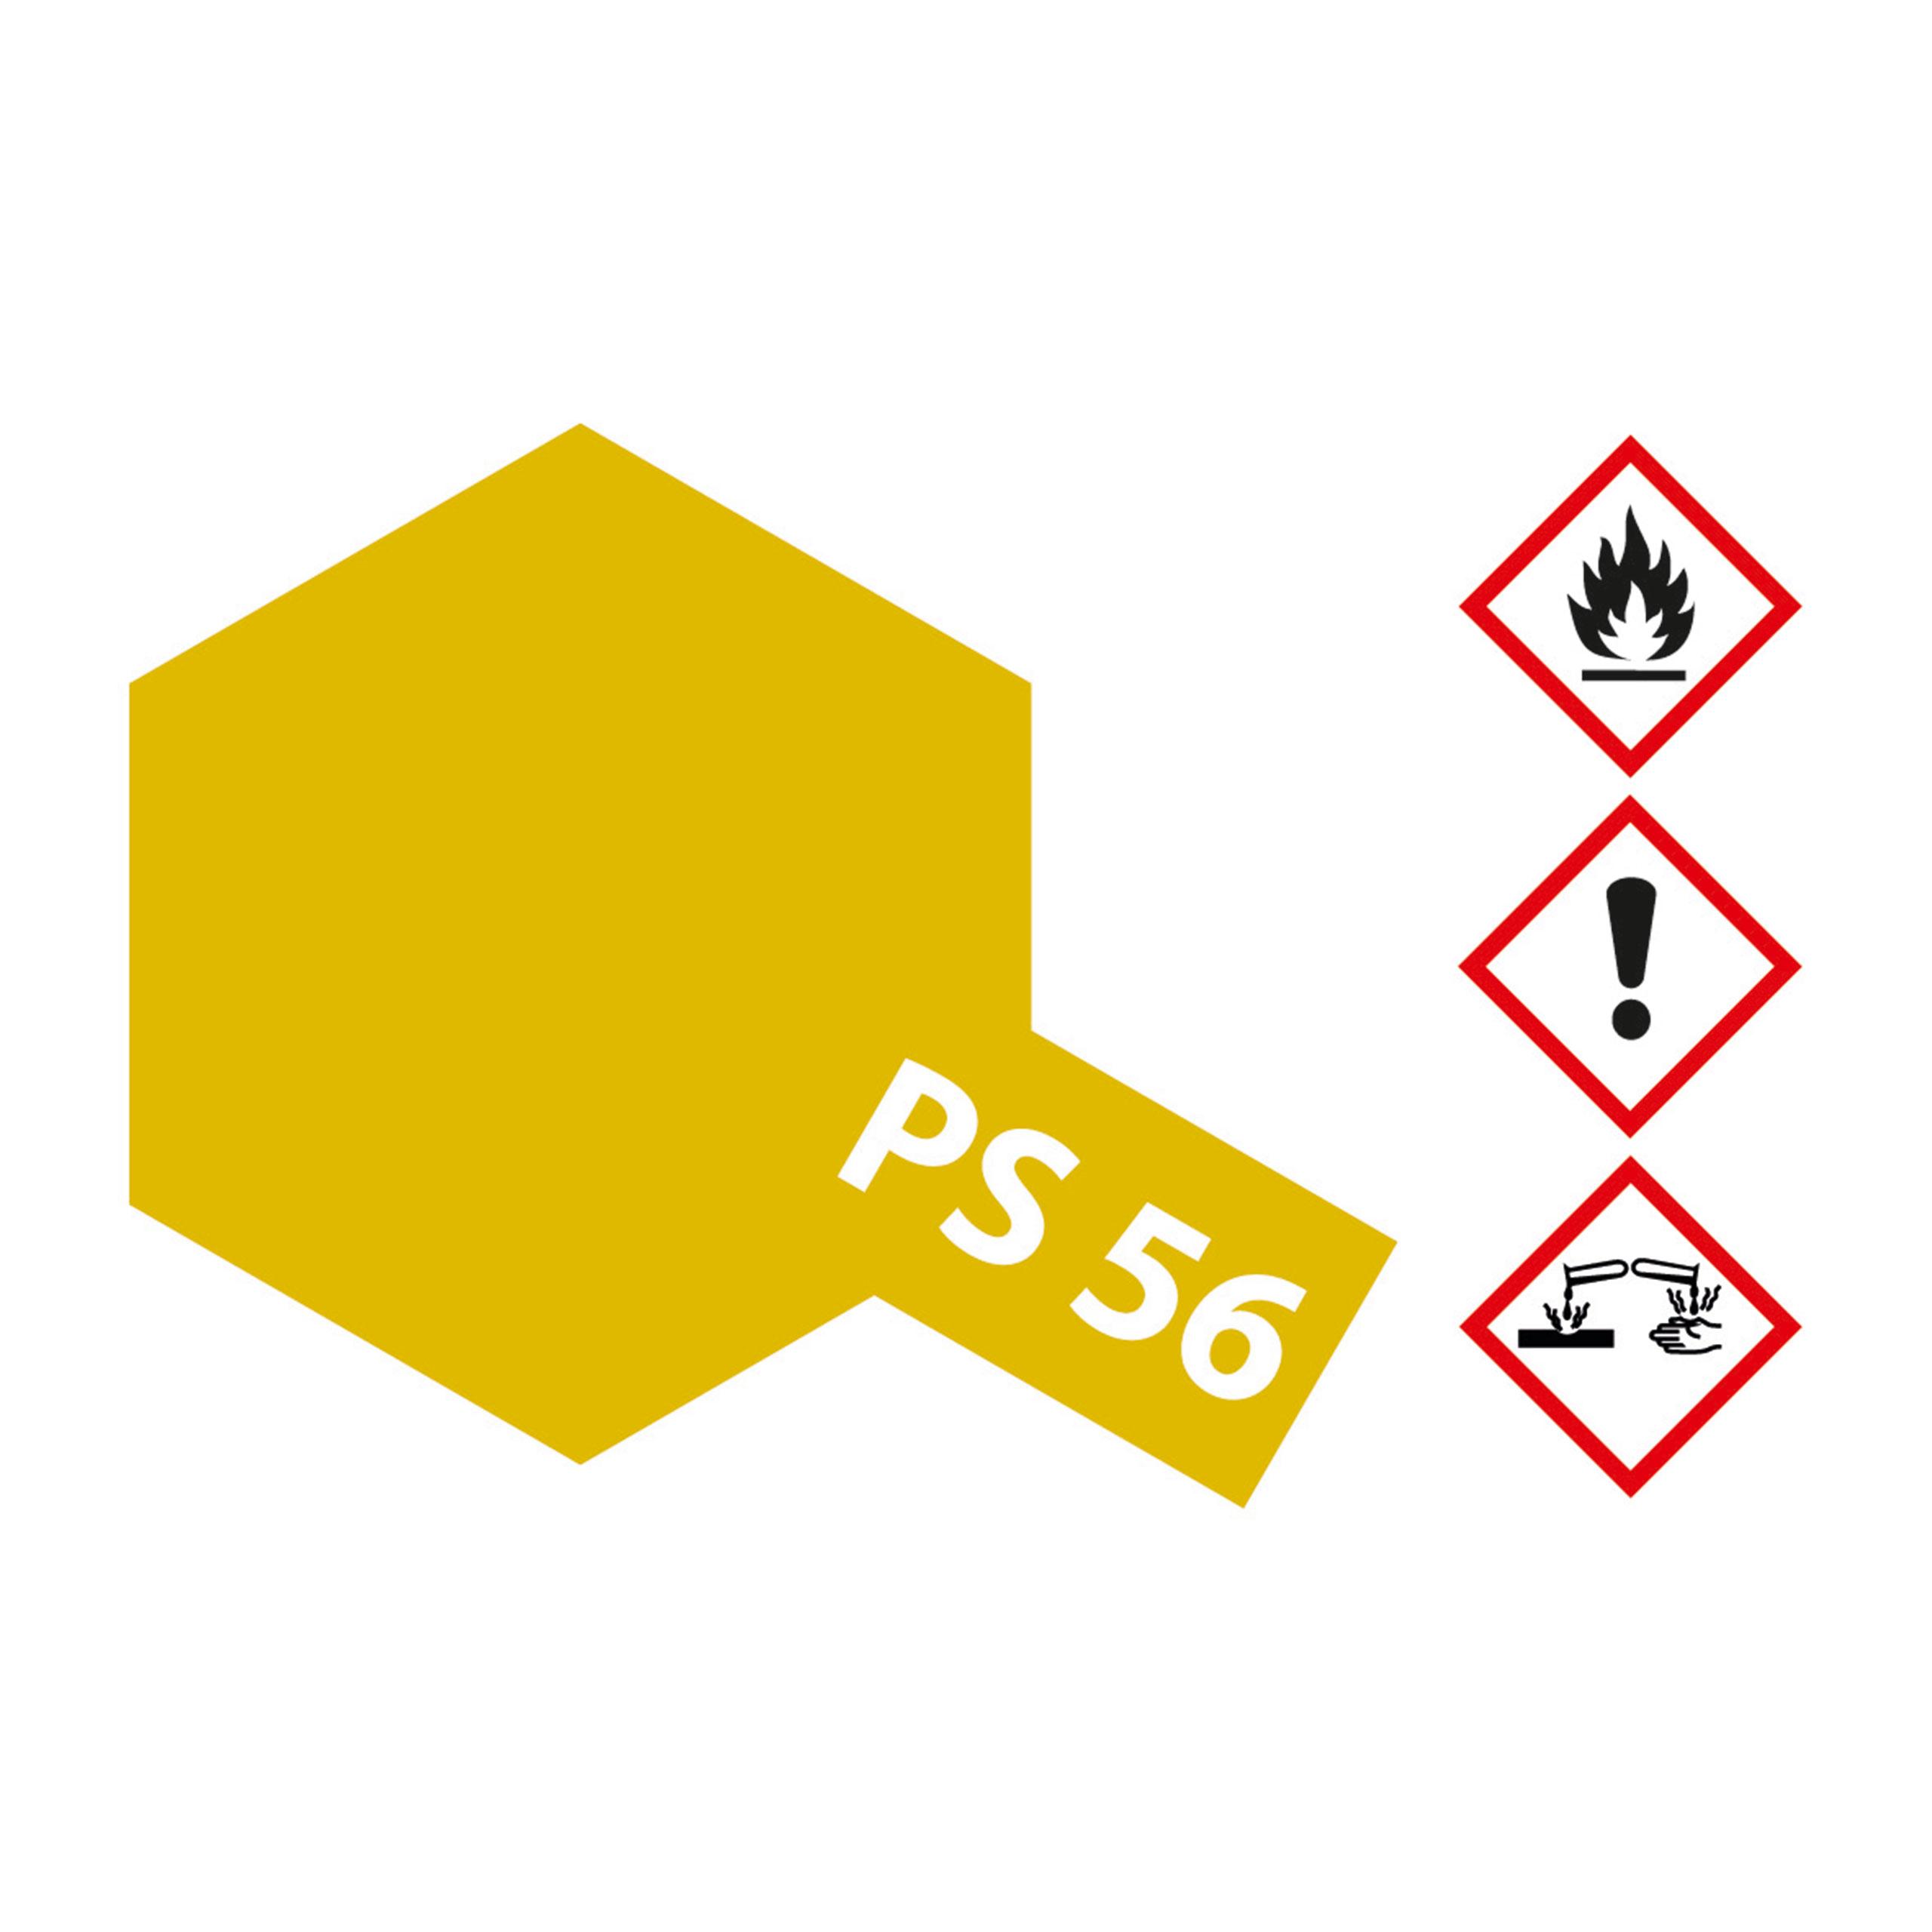 PS-56 Senfgelb Polycarbonat - 100ml Sprayfarbe Lexan - Tamiya 300086056